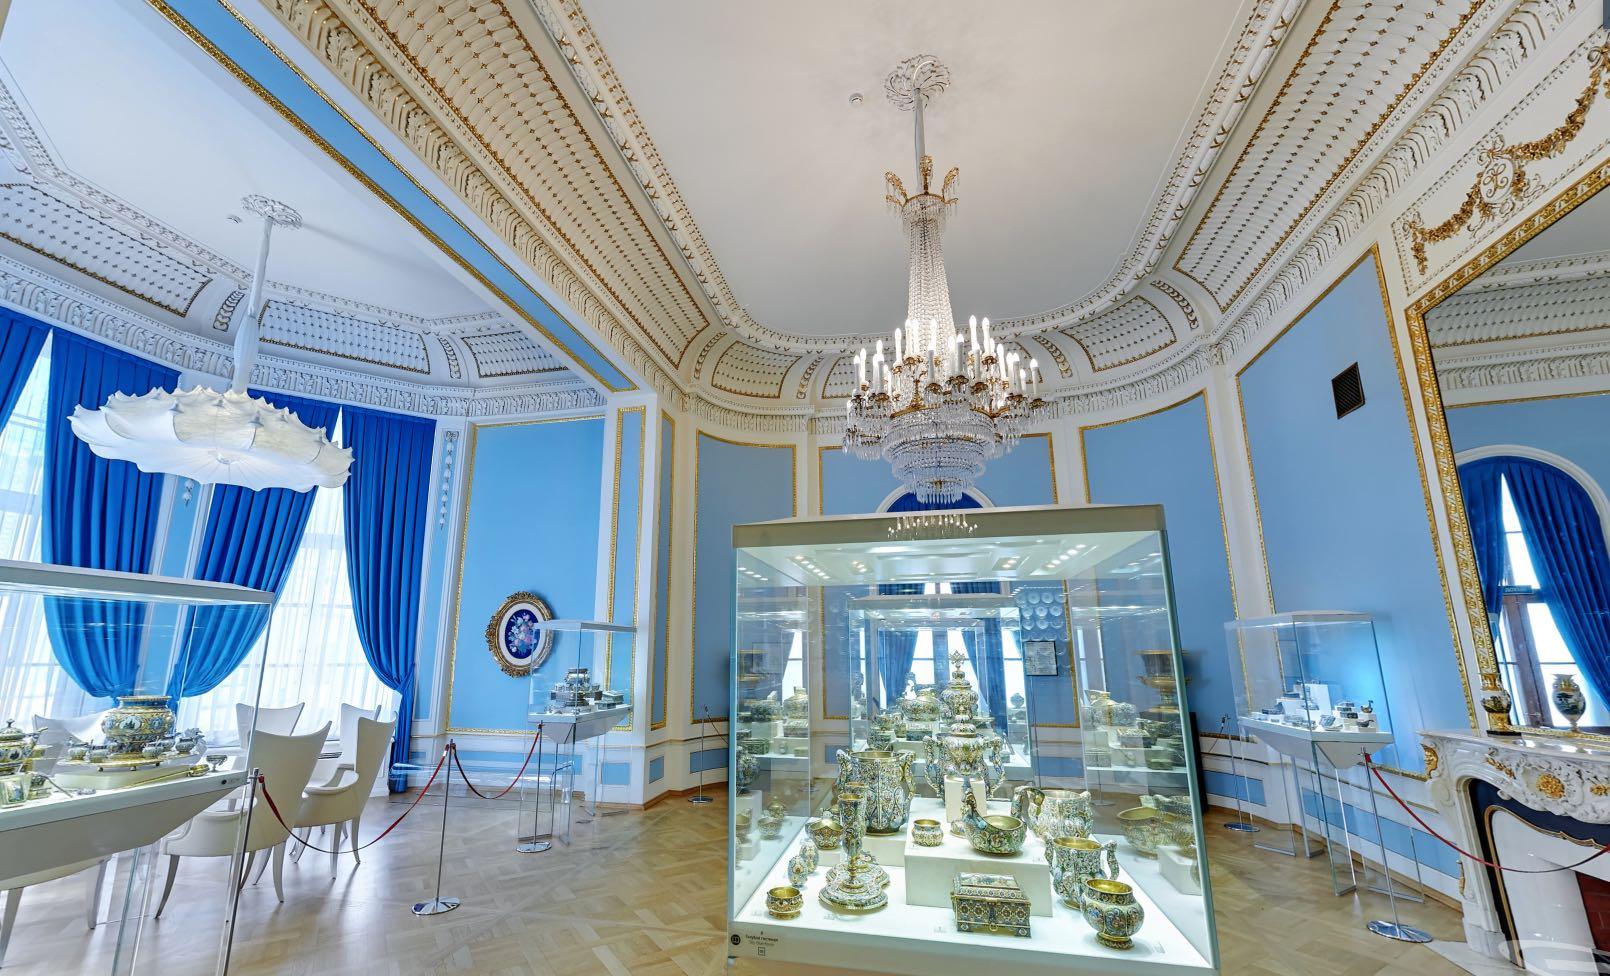 Porzellansaal - Fabergé Museum